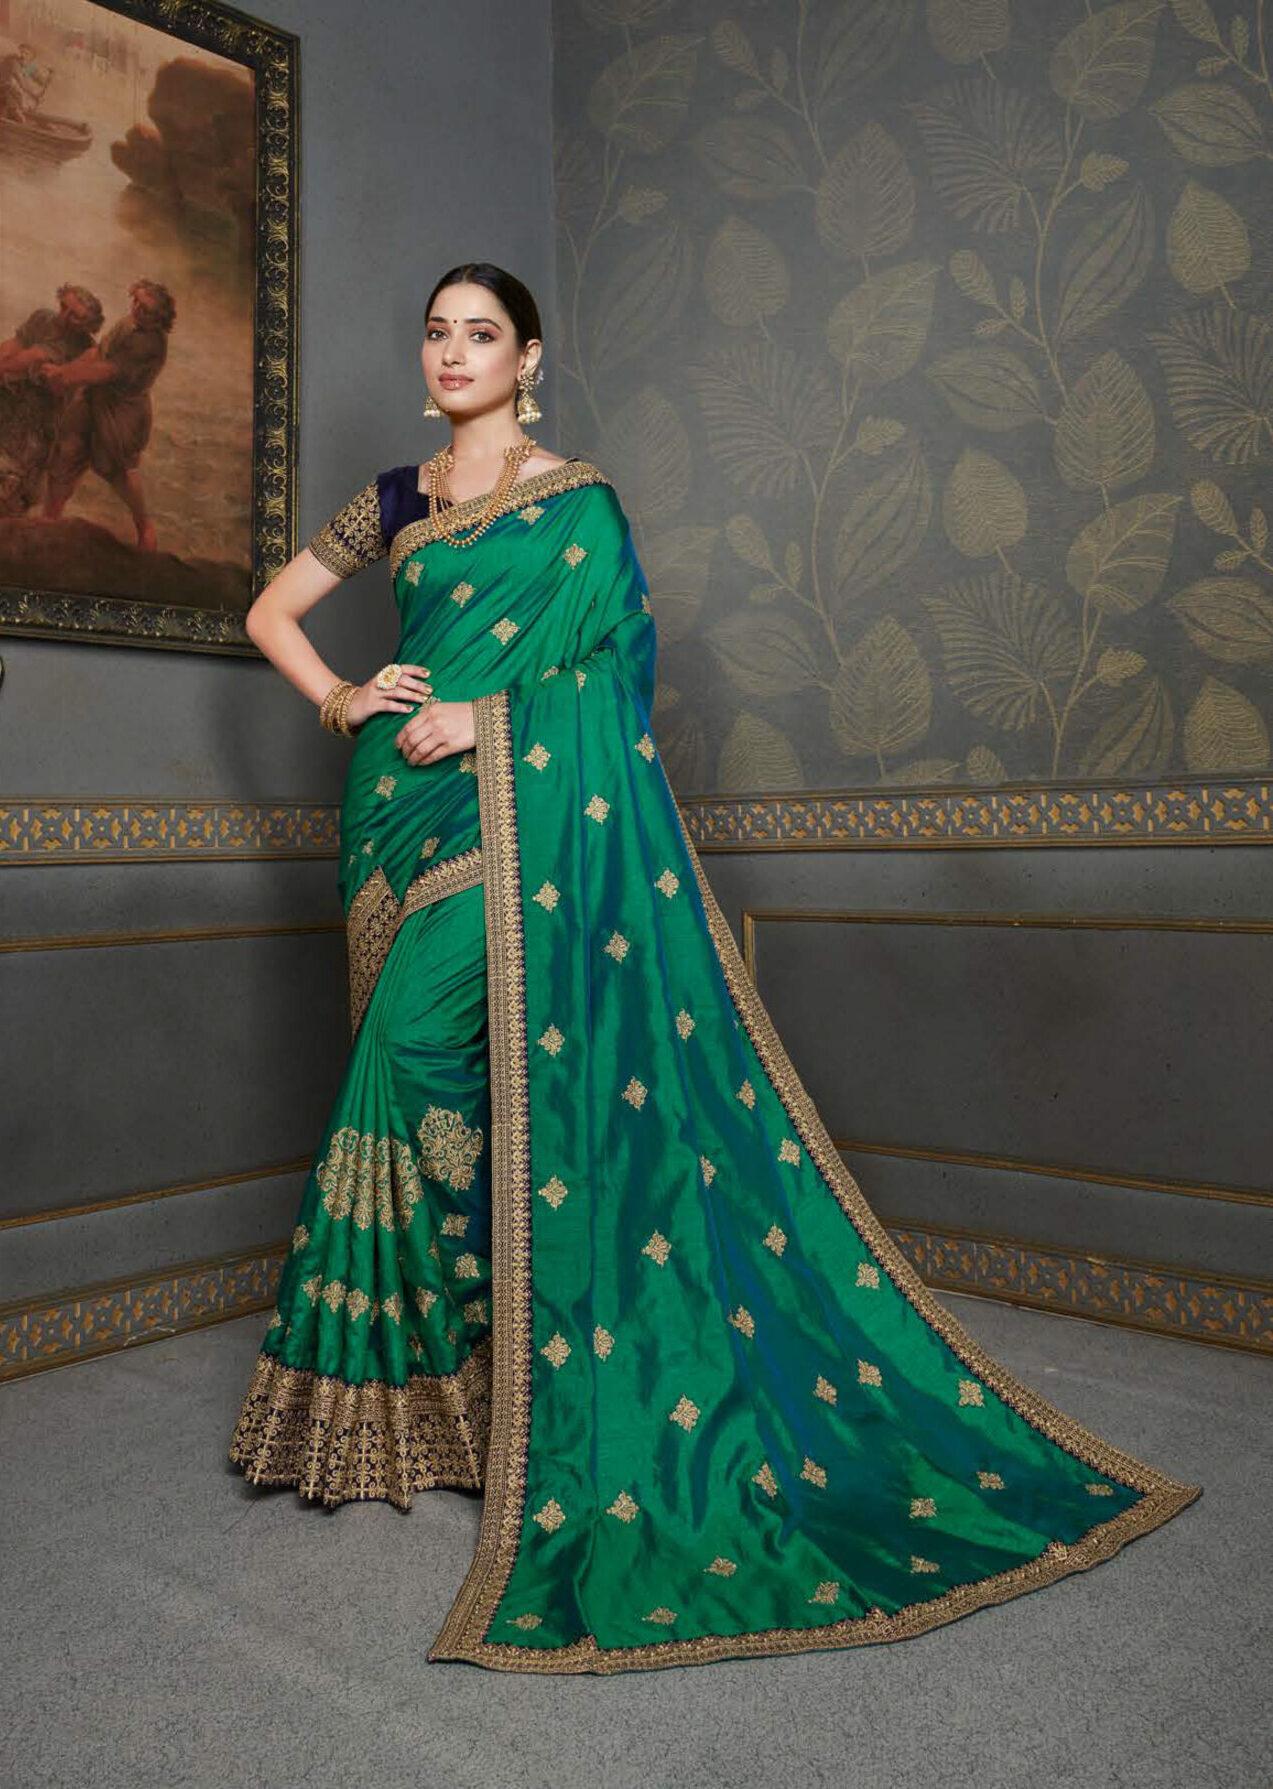 Green Colour Gold Border Party Wear Saree Latest Design